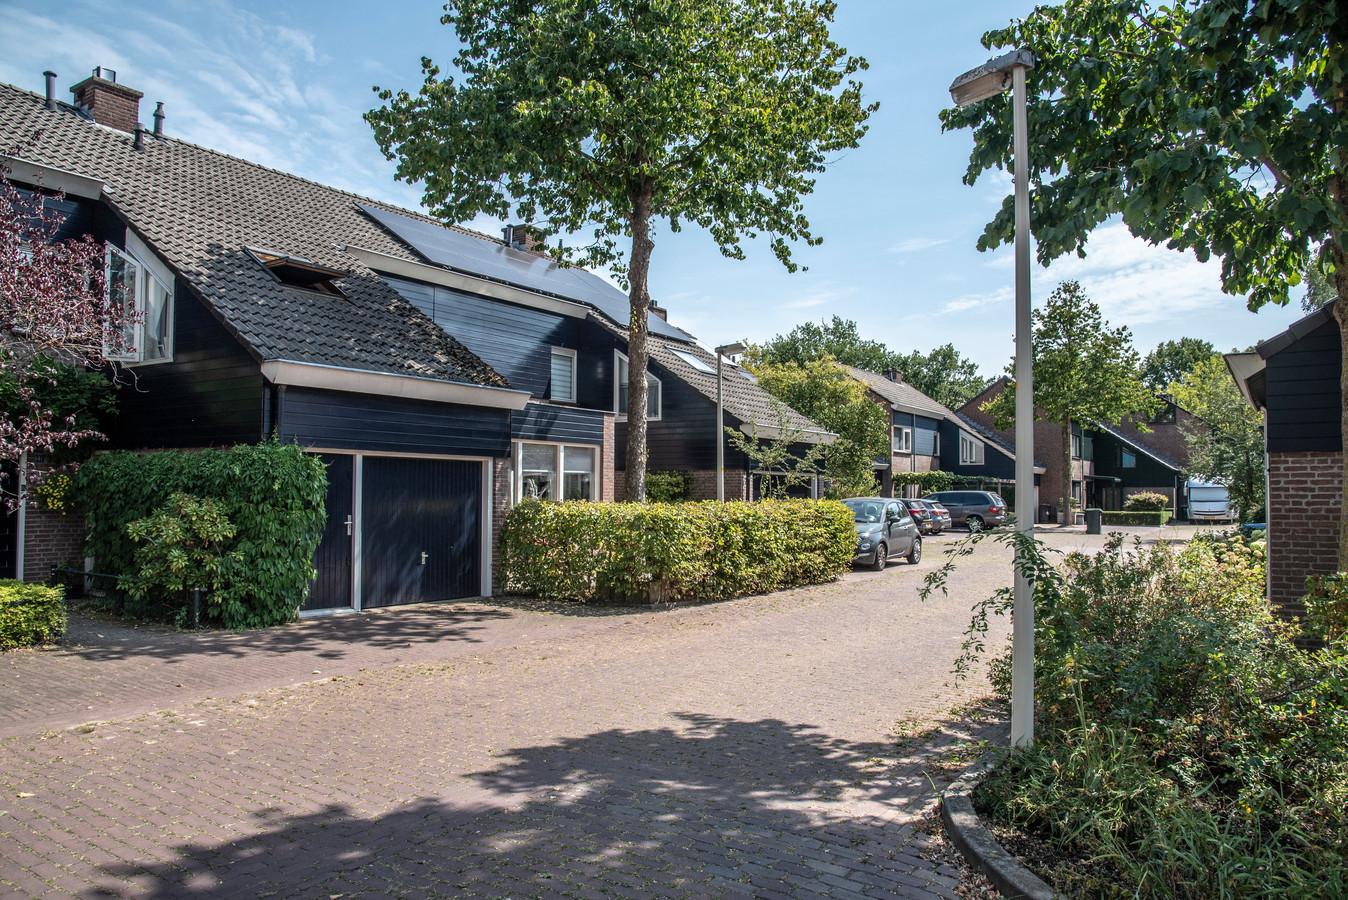 Malden-Oost in Heumen.